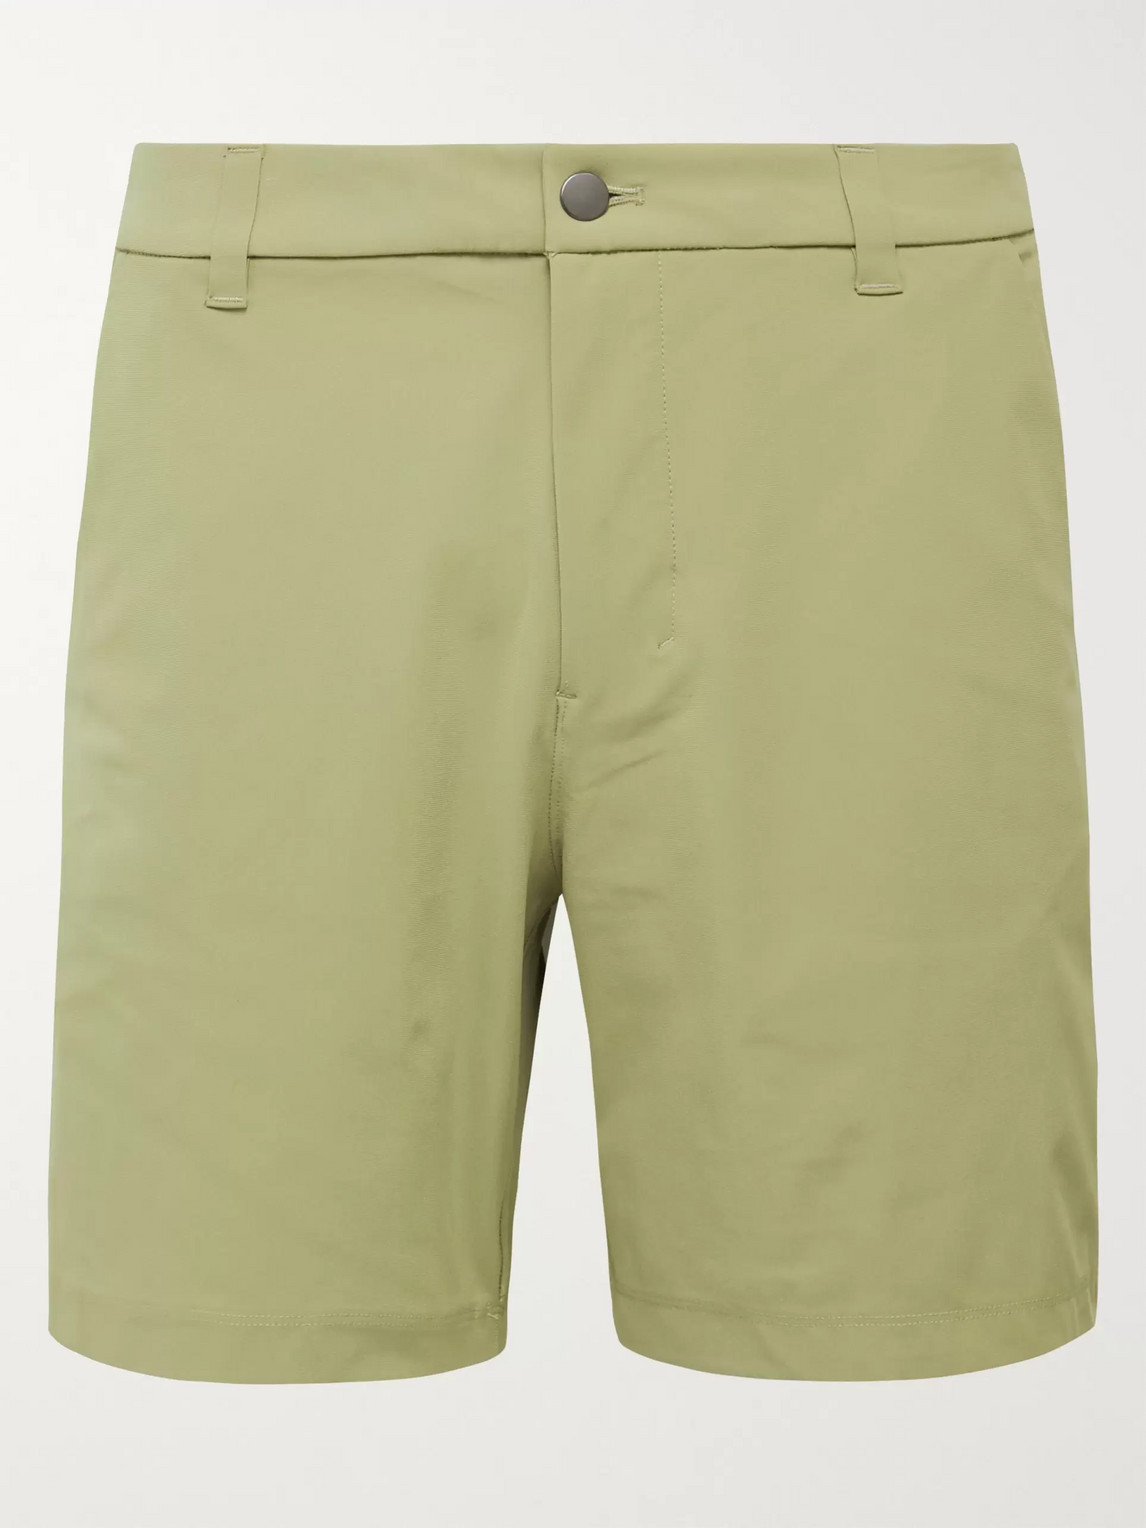 lululemon - commission warpstreme shorts - men - neutrals